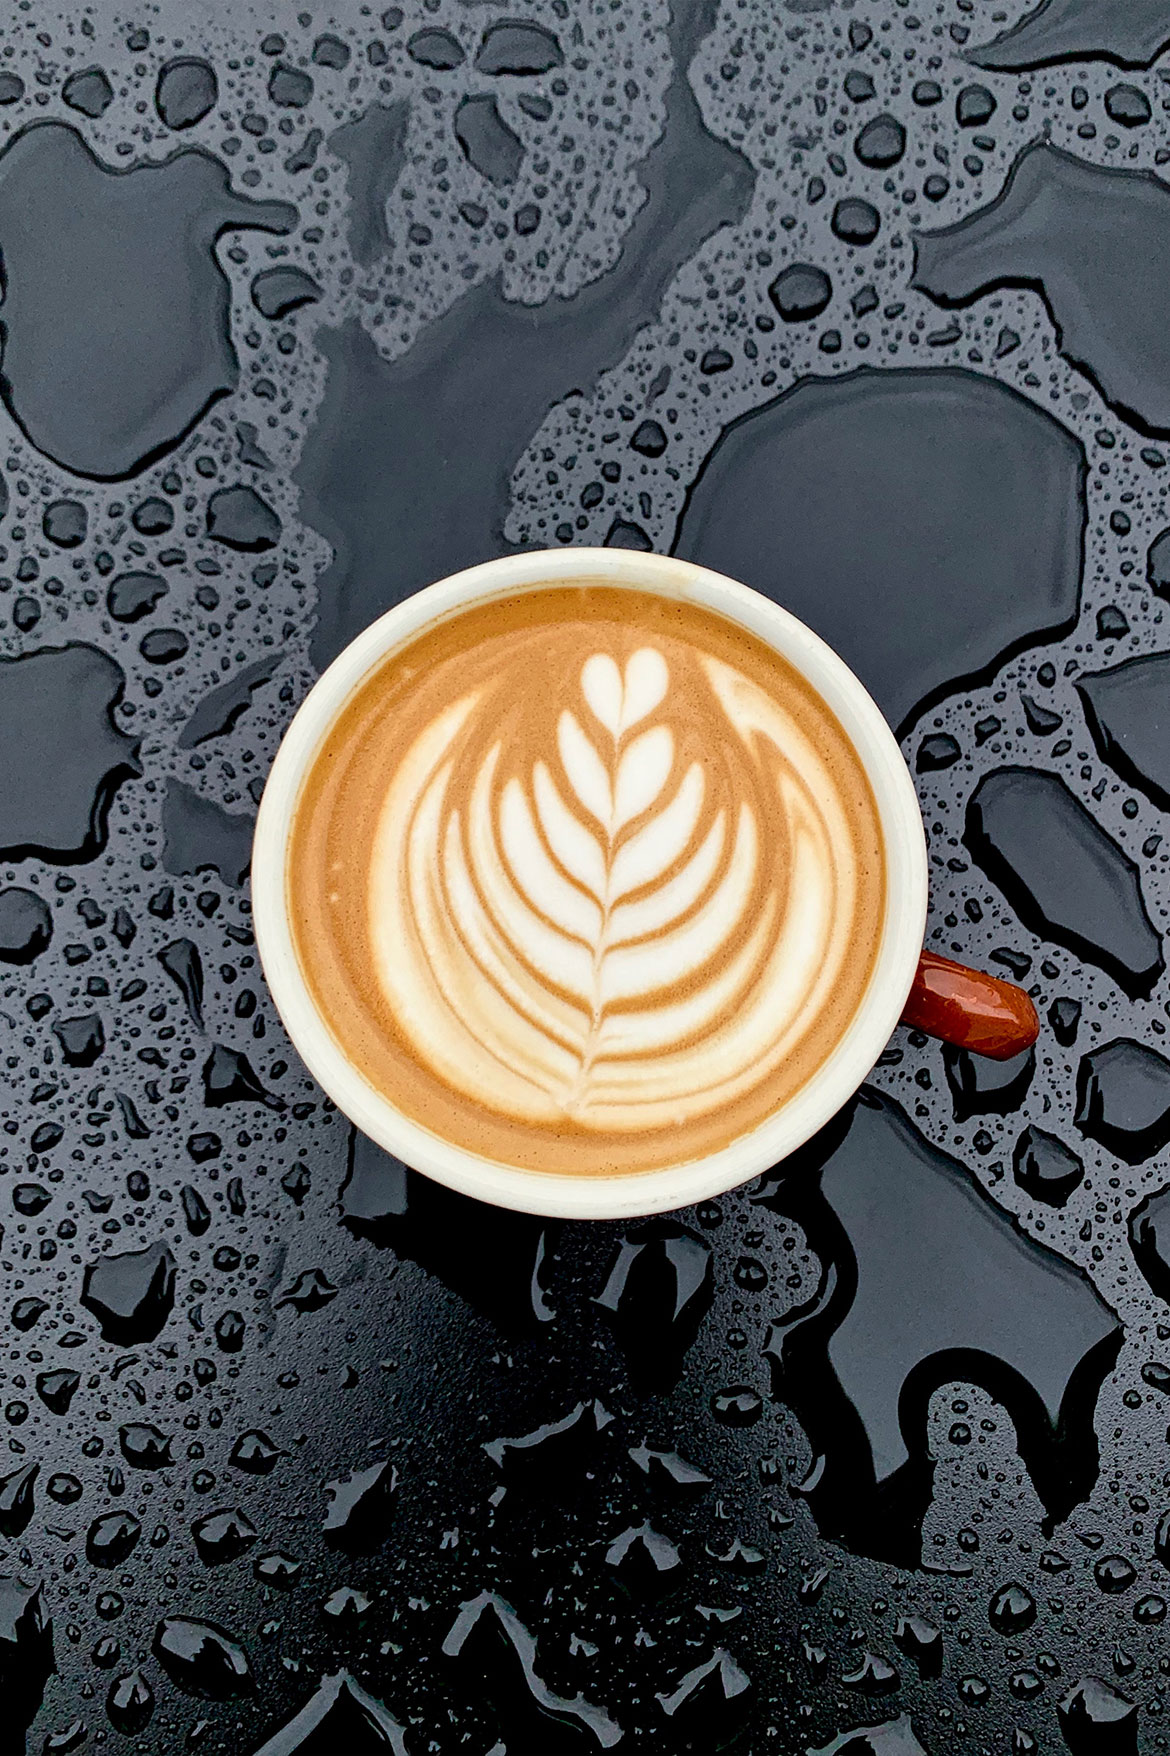 Latte art with rain